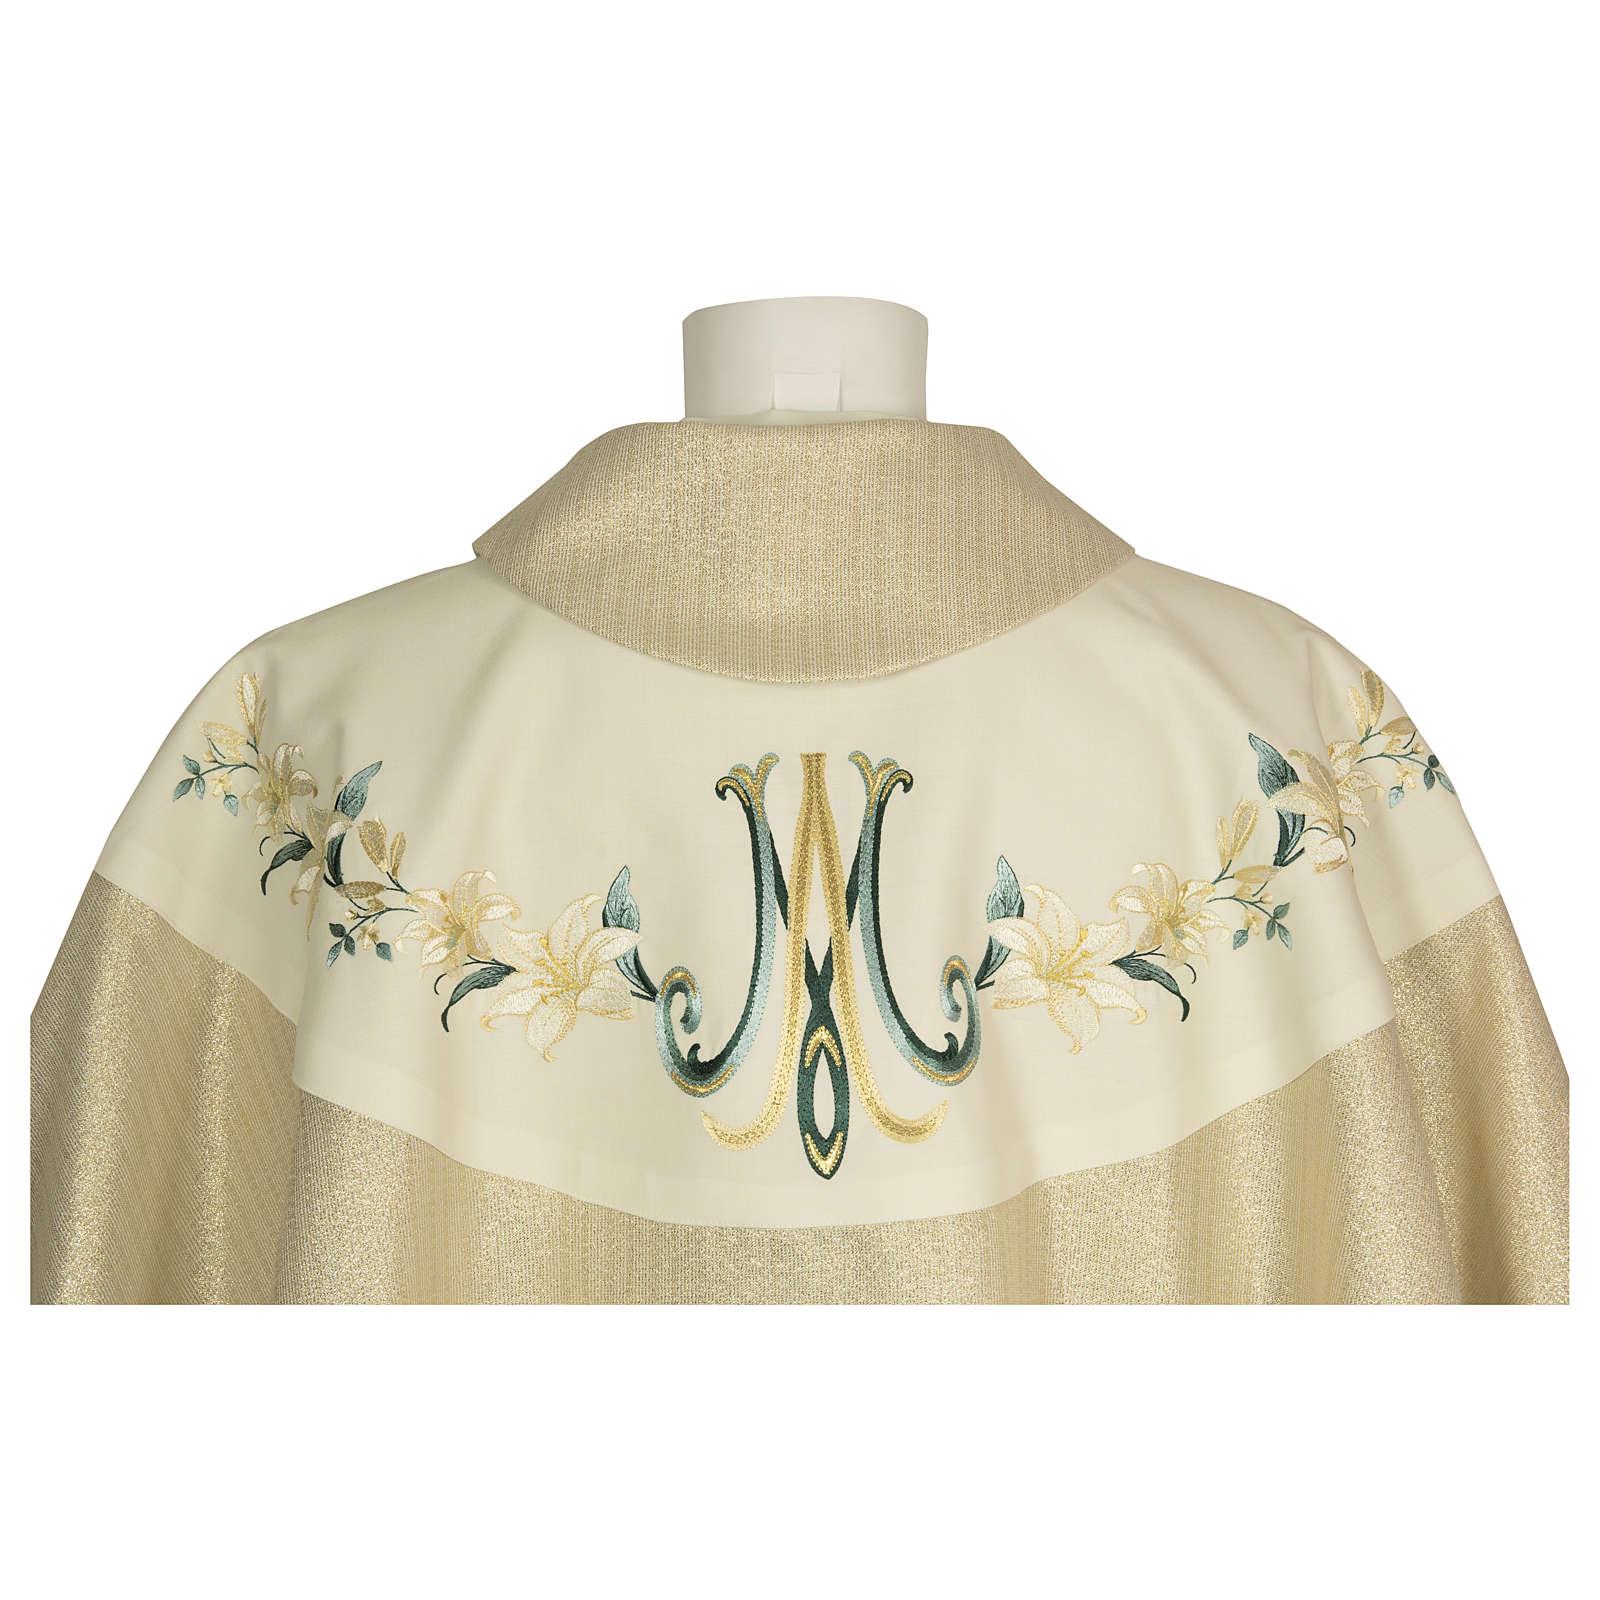 Casula ricamata fiori mariano 100% pura lana naturale 4